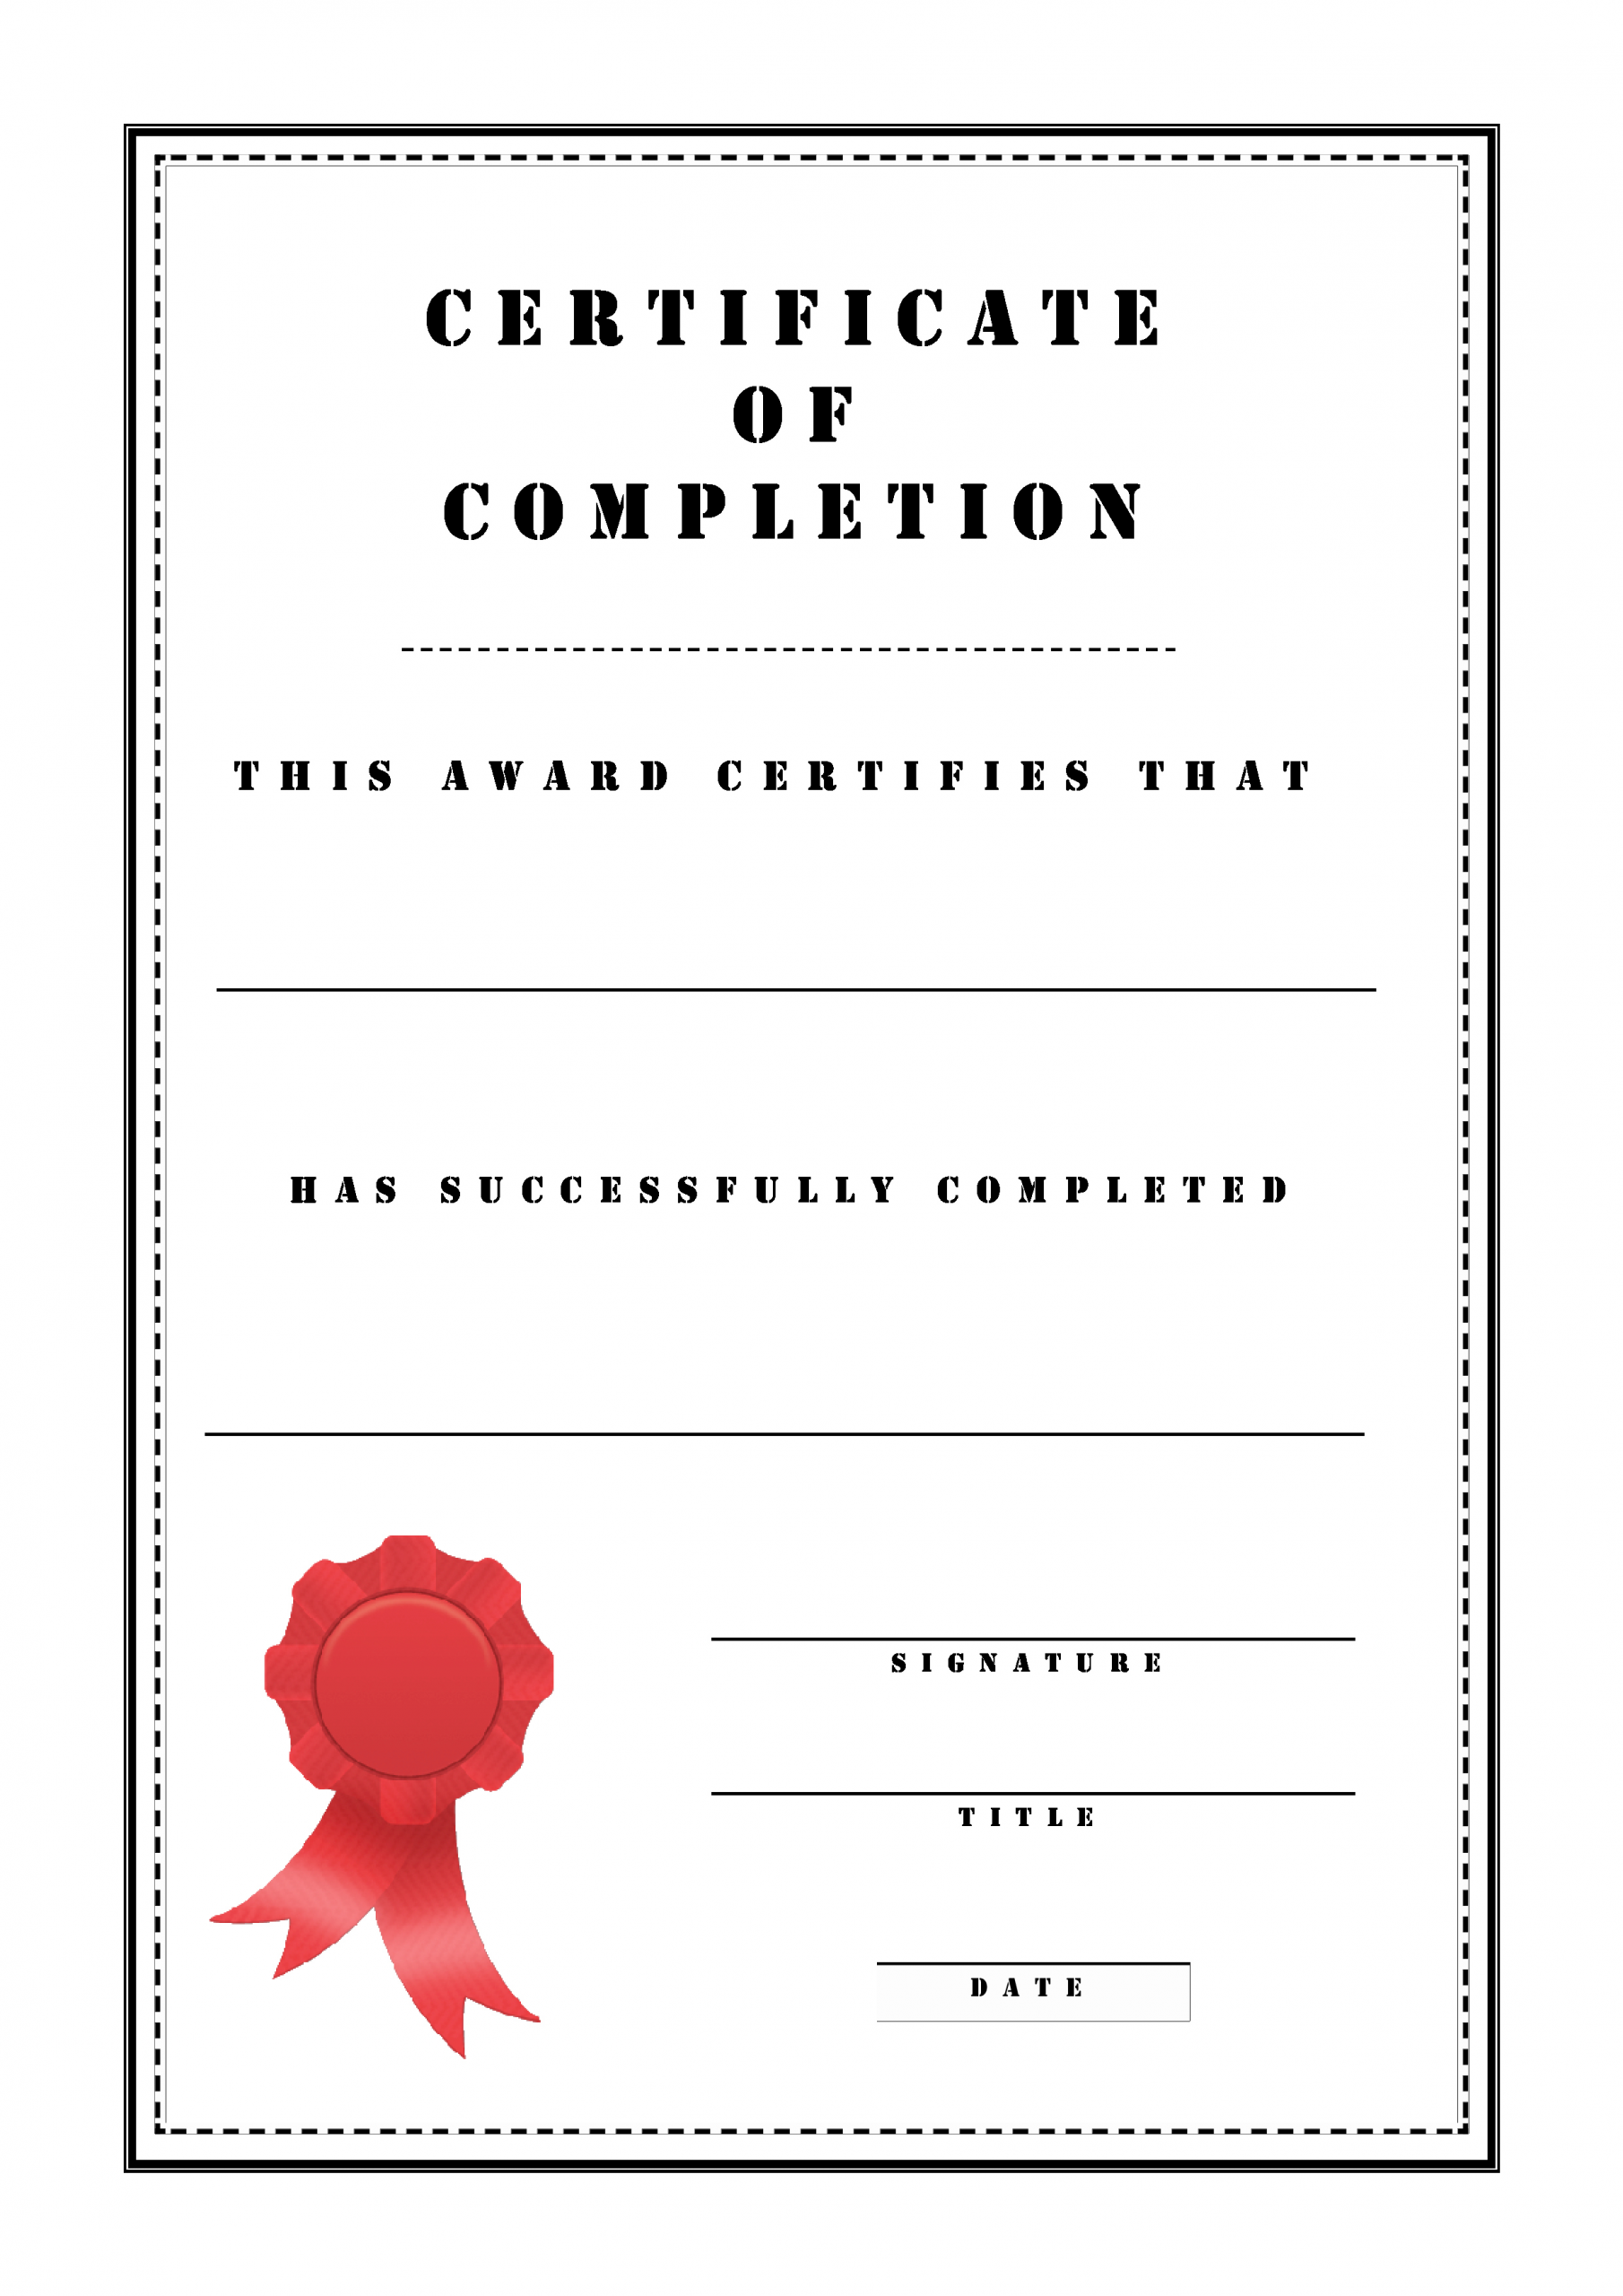 Junior Achievement Certificate Of Achievement Template Lovely Blank Certificate Of Achievement Clipart Images Gallery